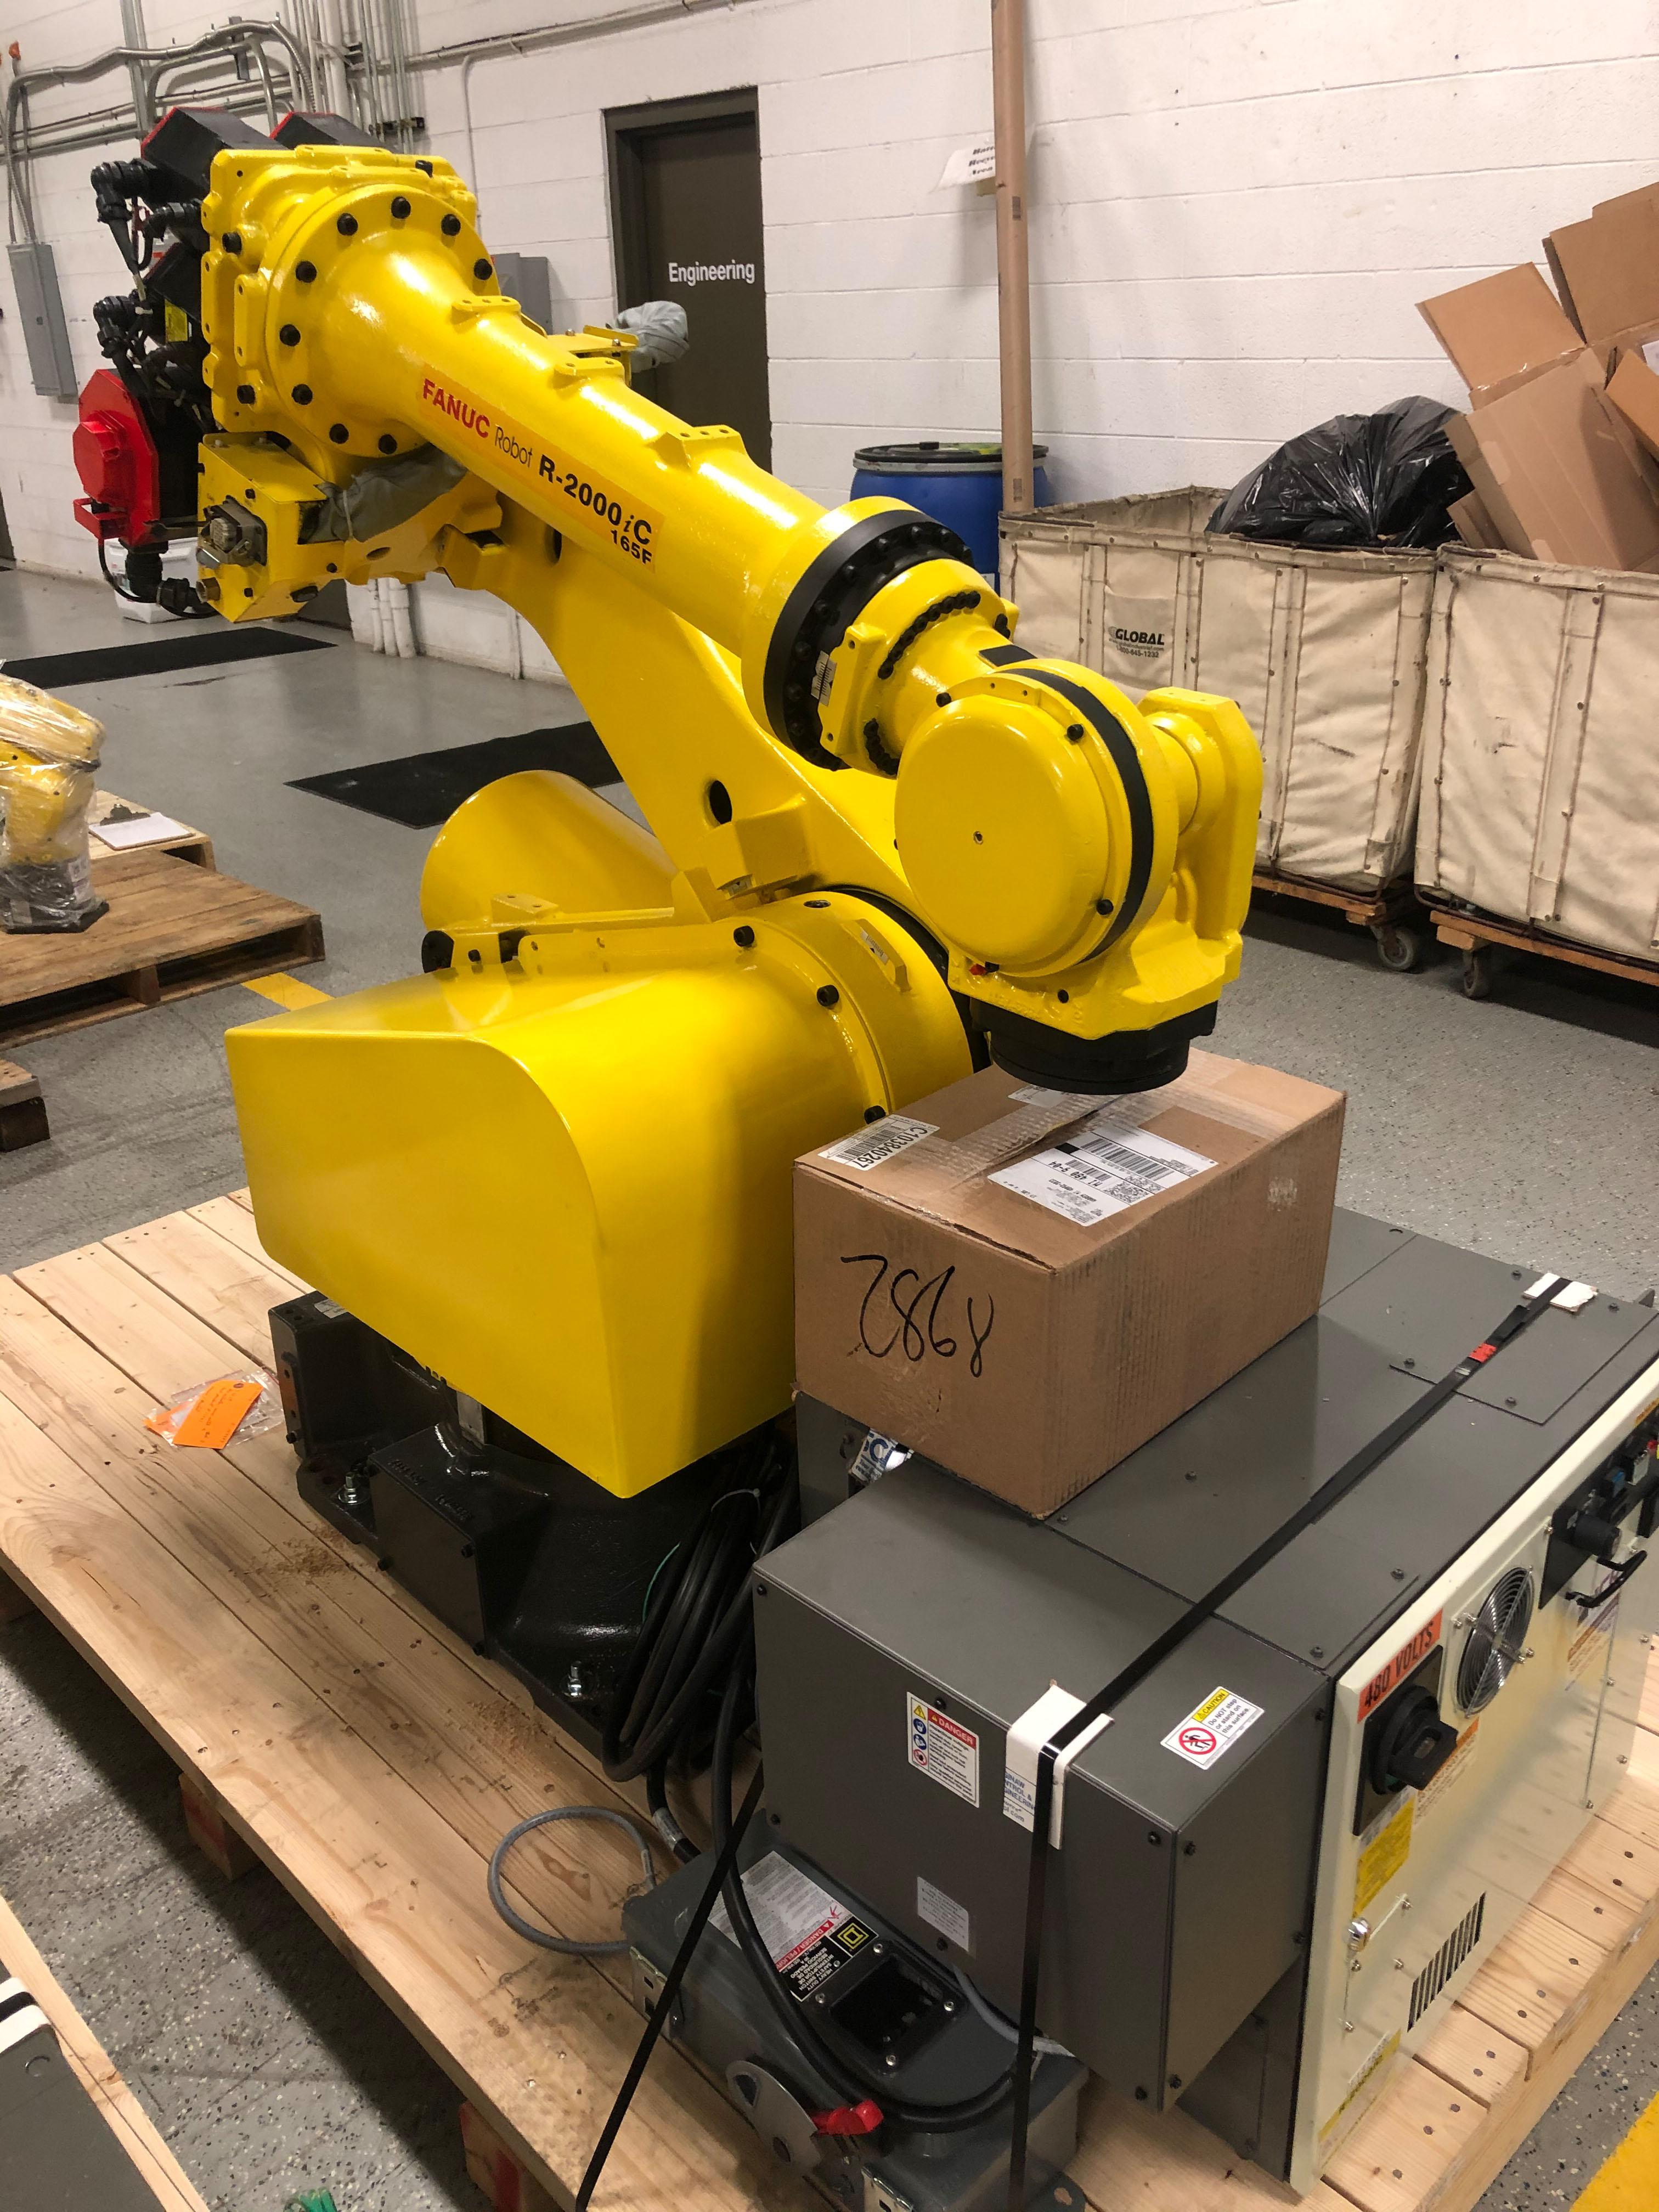 Fanuc R-2000iC Industrial Robot